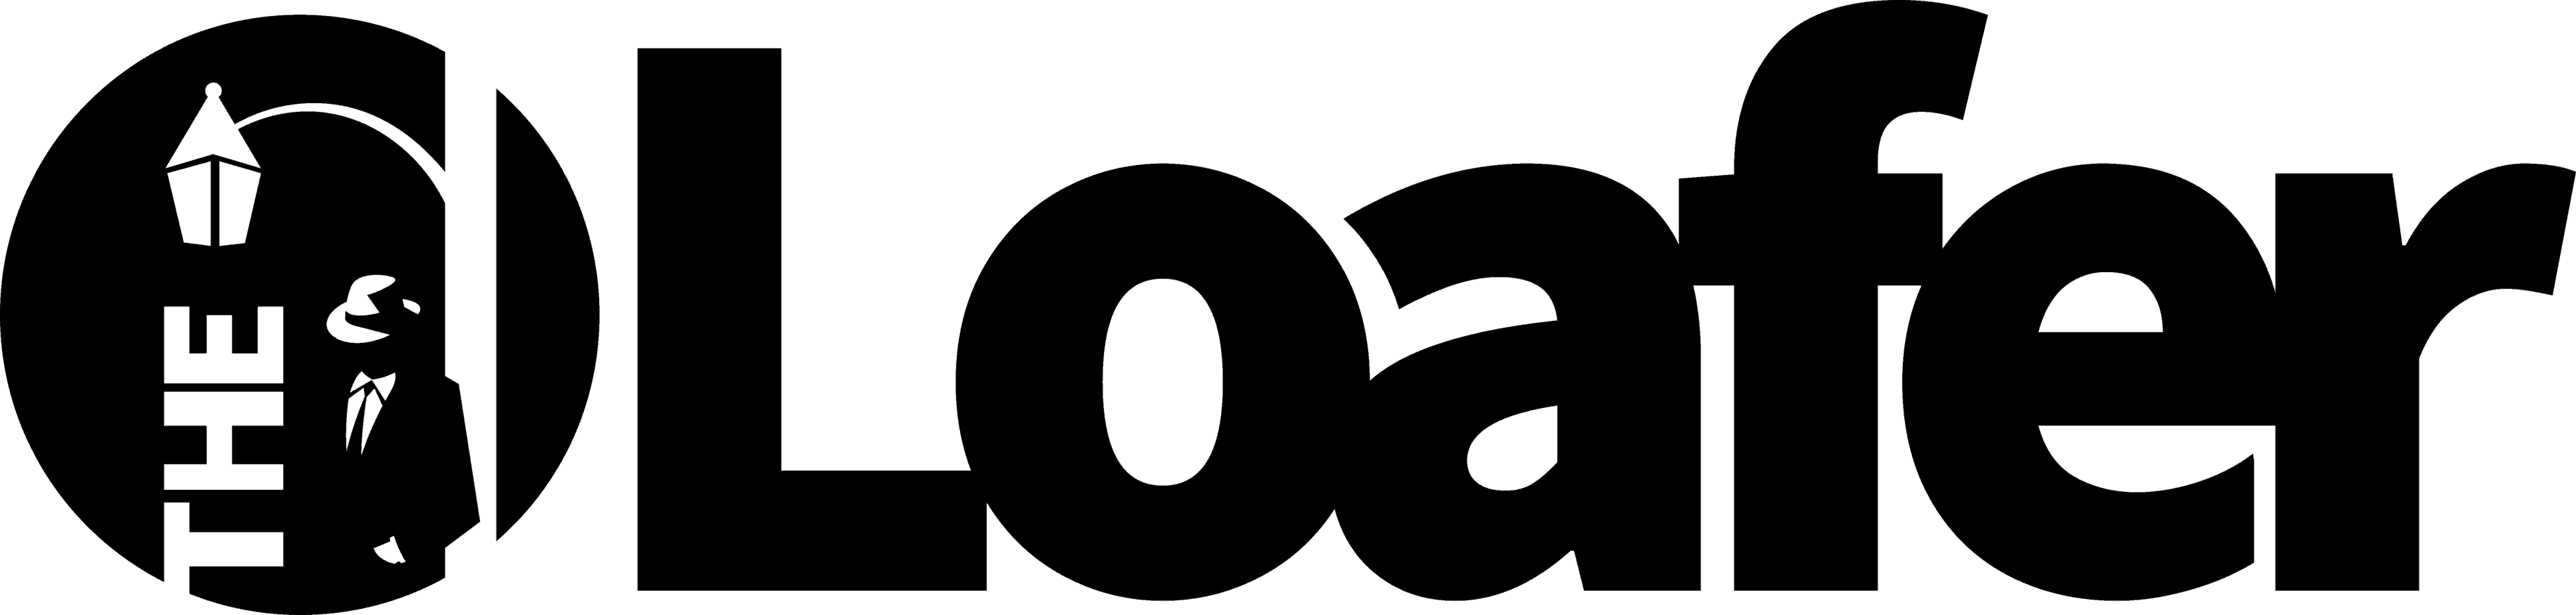 LoaferLogo